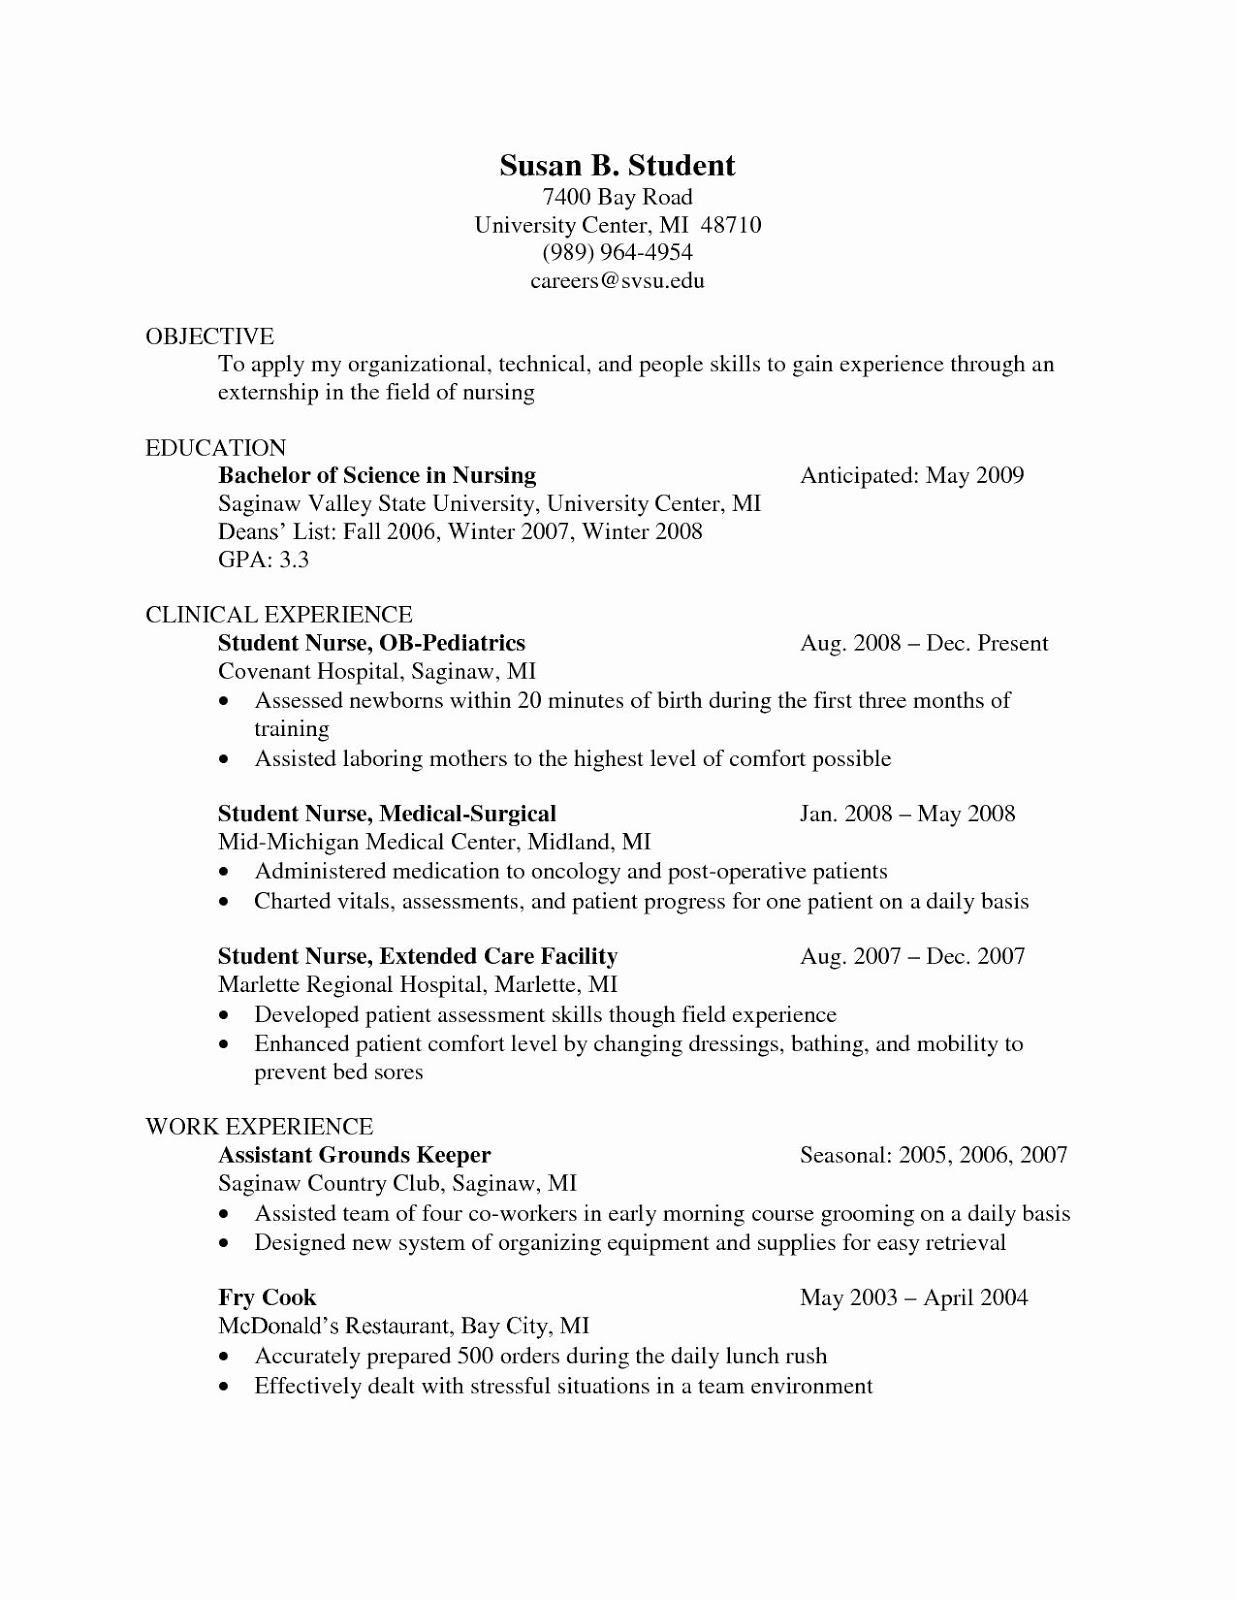 Ob Nurse Resume Objective 2019 Ob Nurse Resume Templates 2020